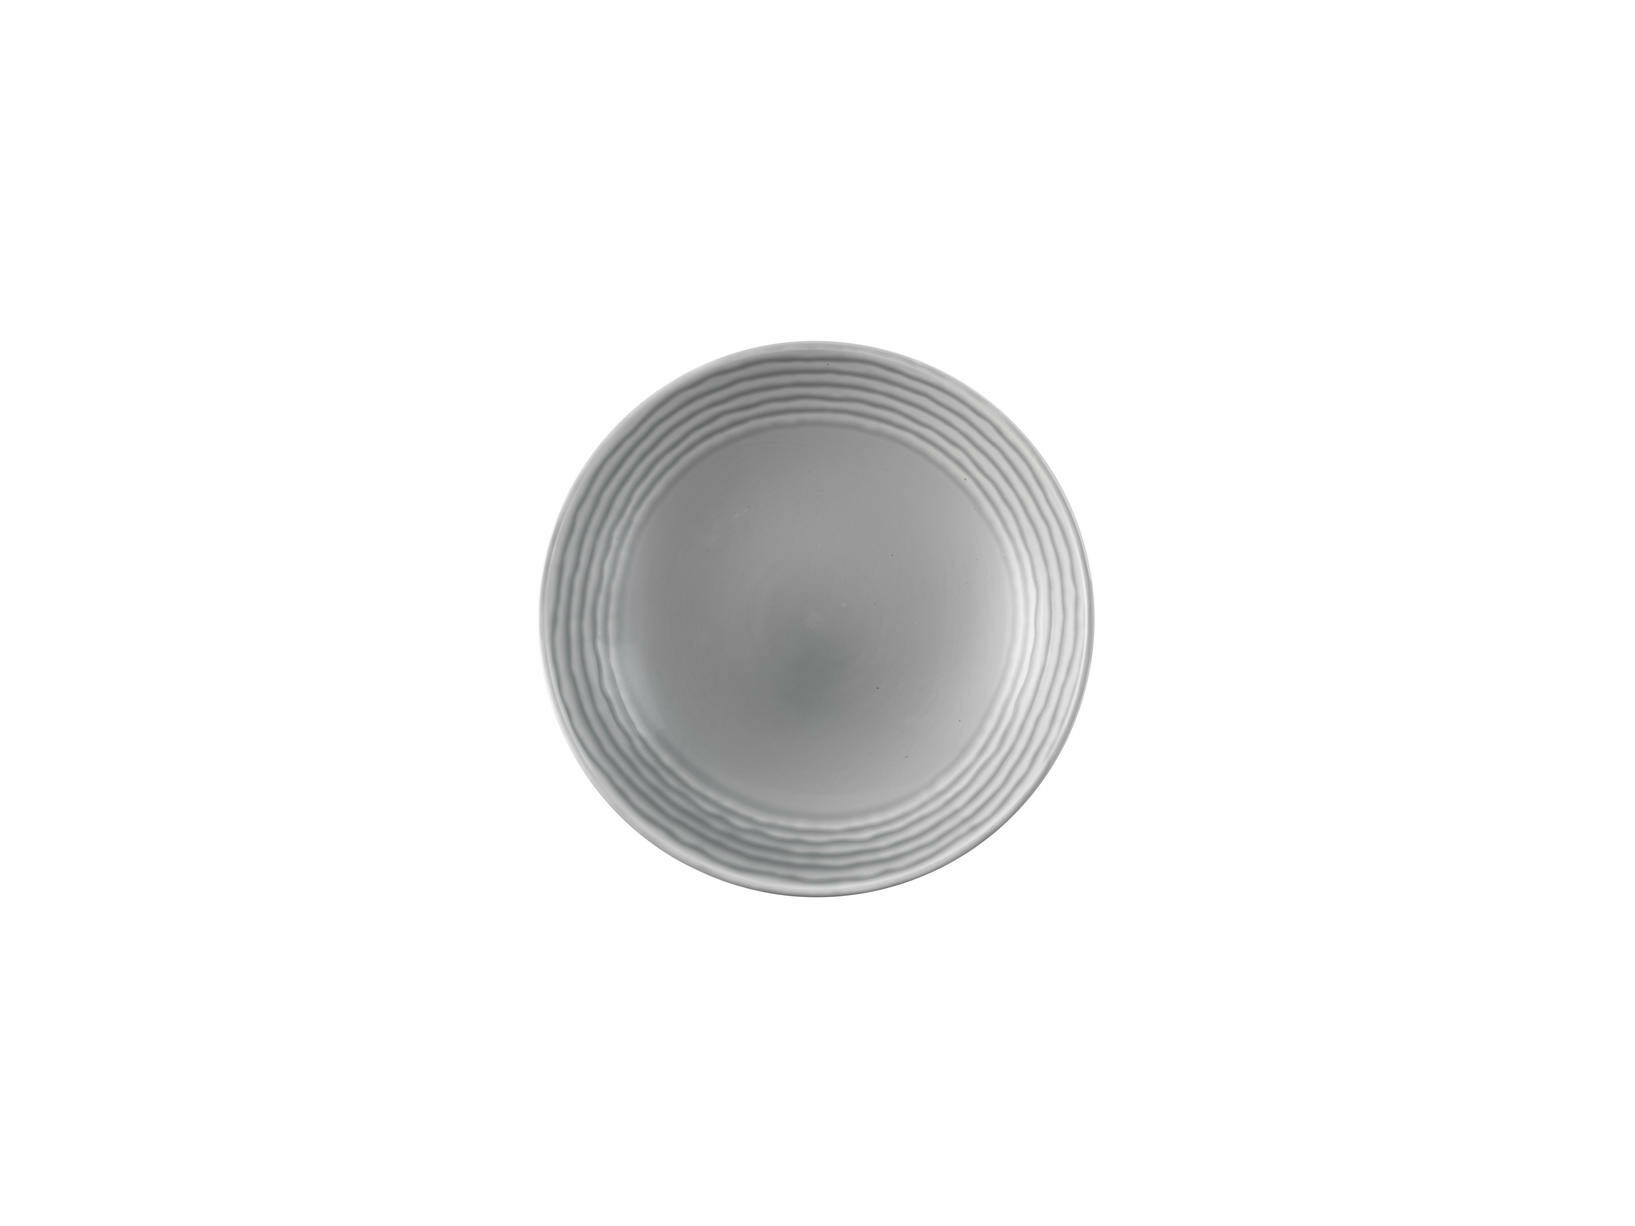 Dudson Harvest Norse Grey diep coupe bord 25,5 cm